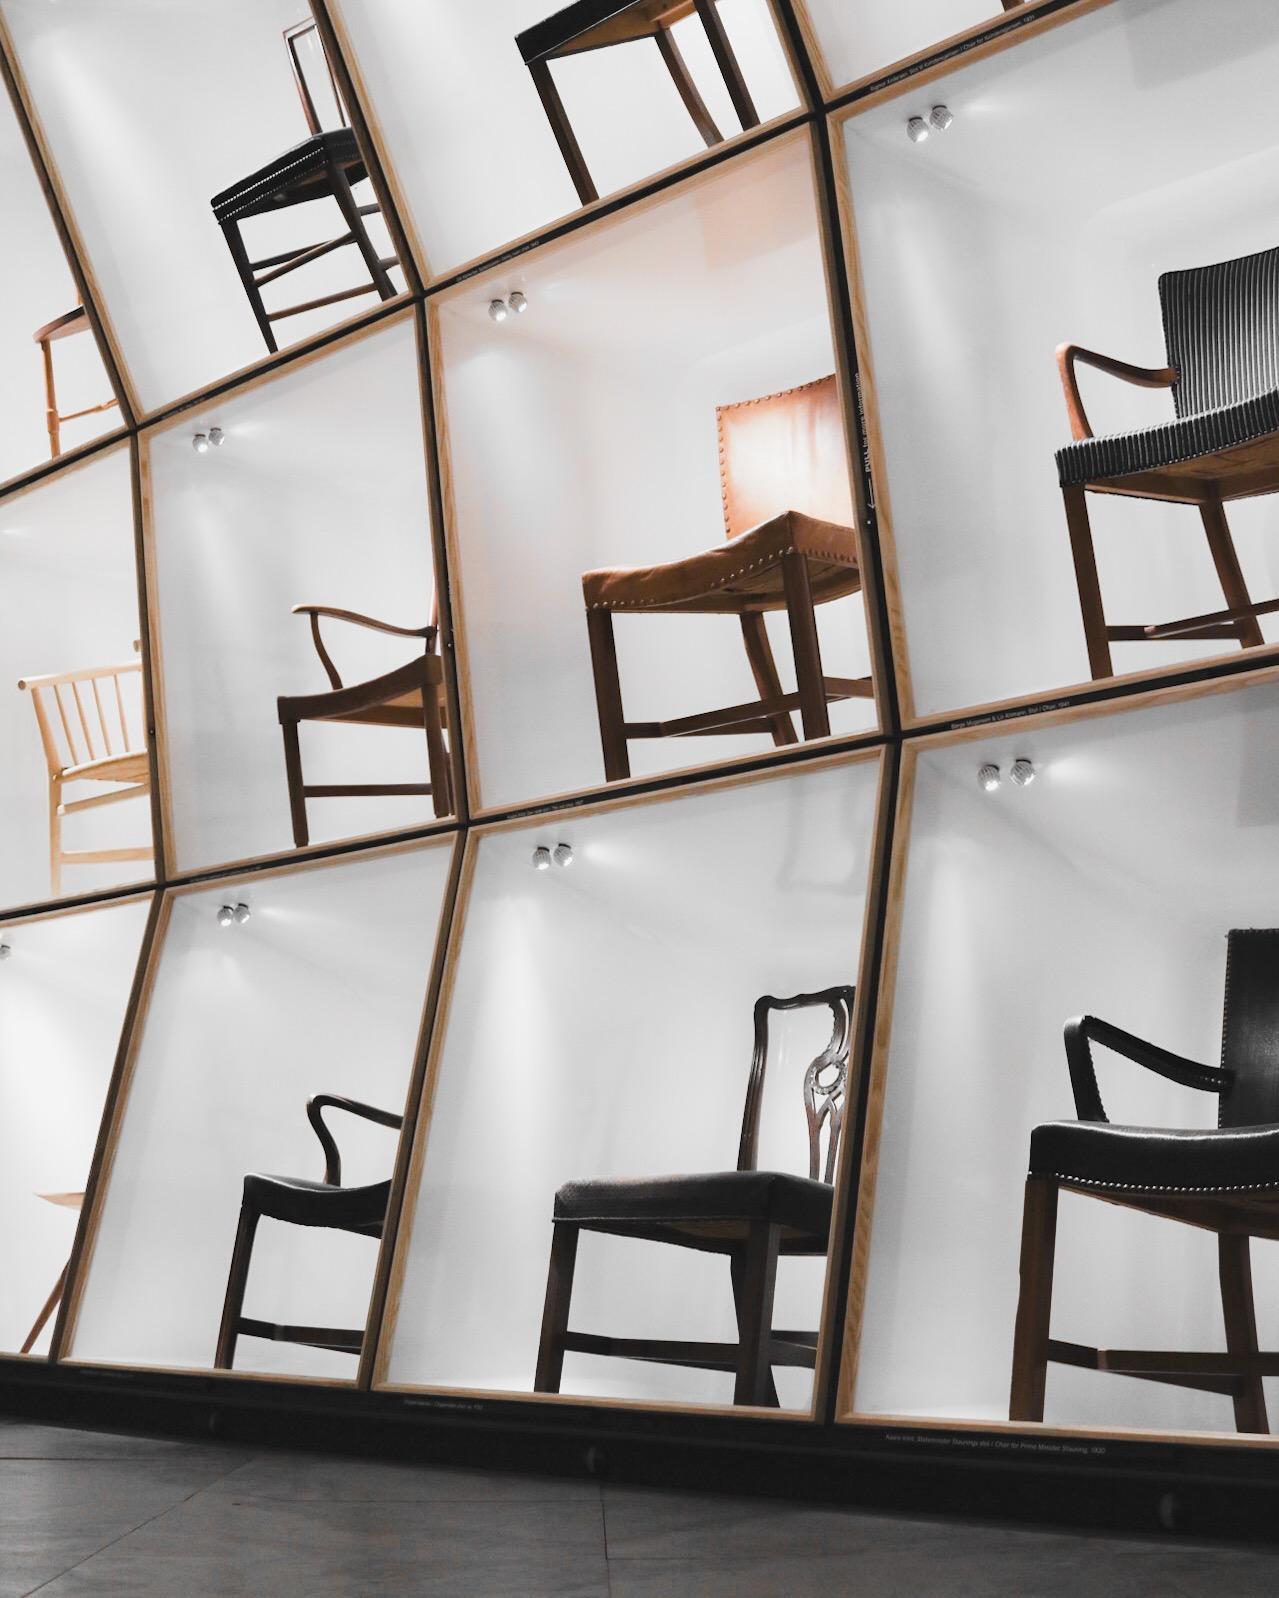 kööpenhamina_designmuseo